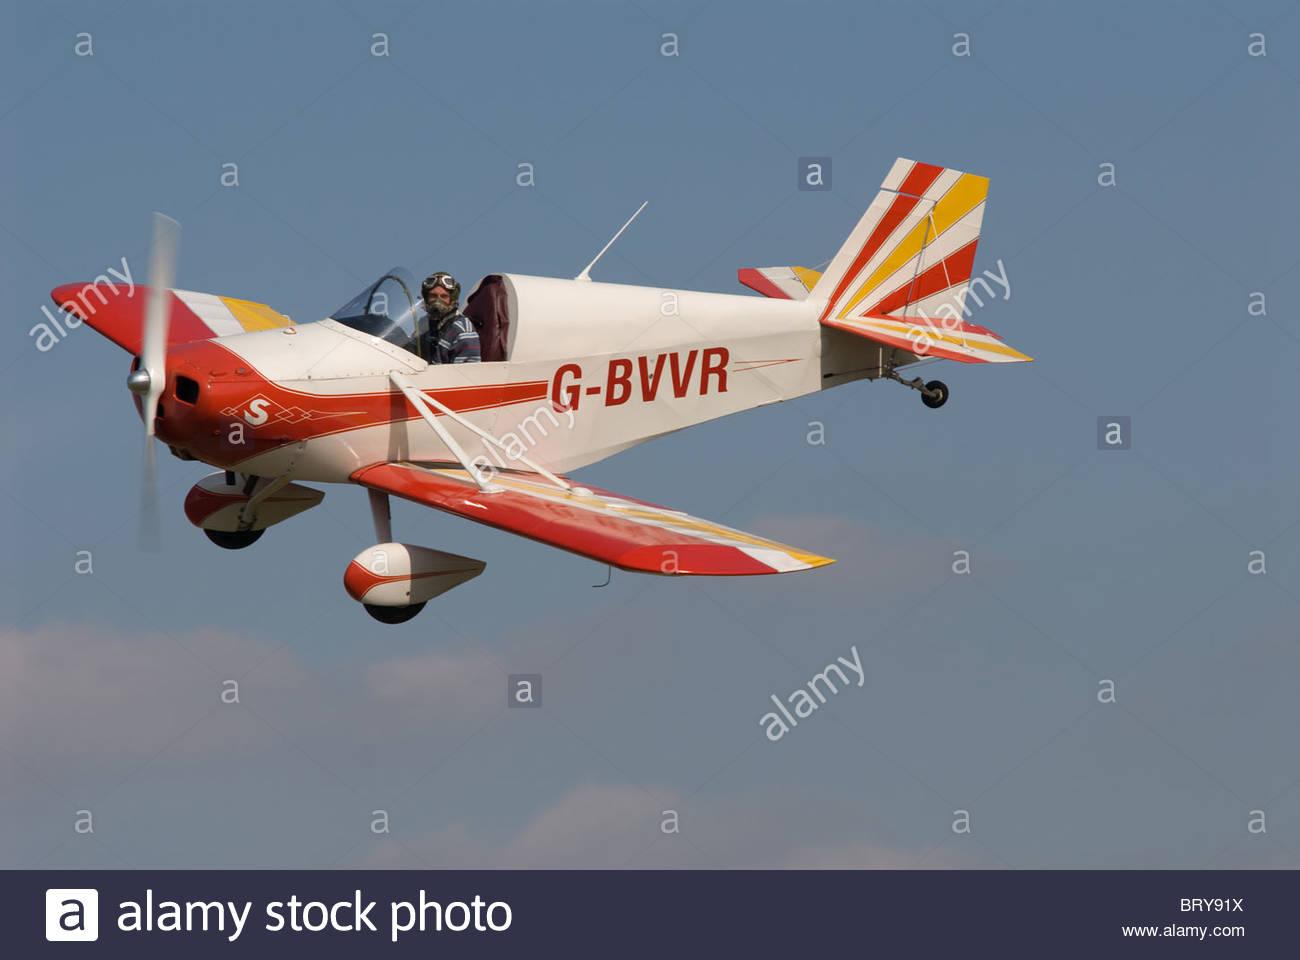 Airfield Aerodrome Monoplane Stock Photos & Airfield